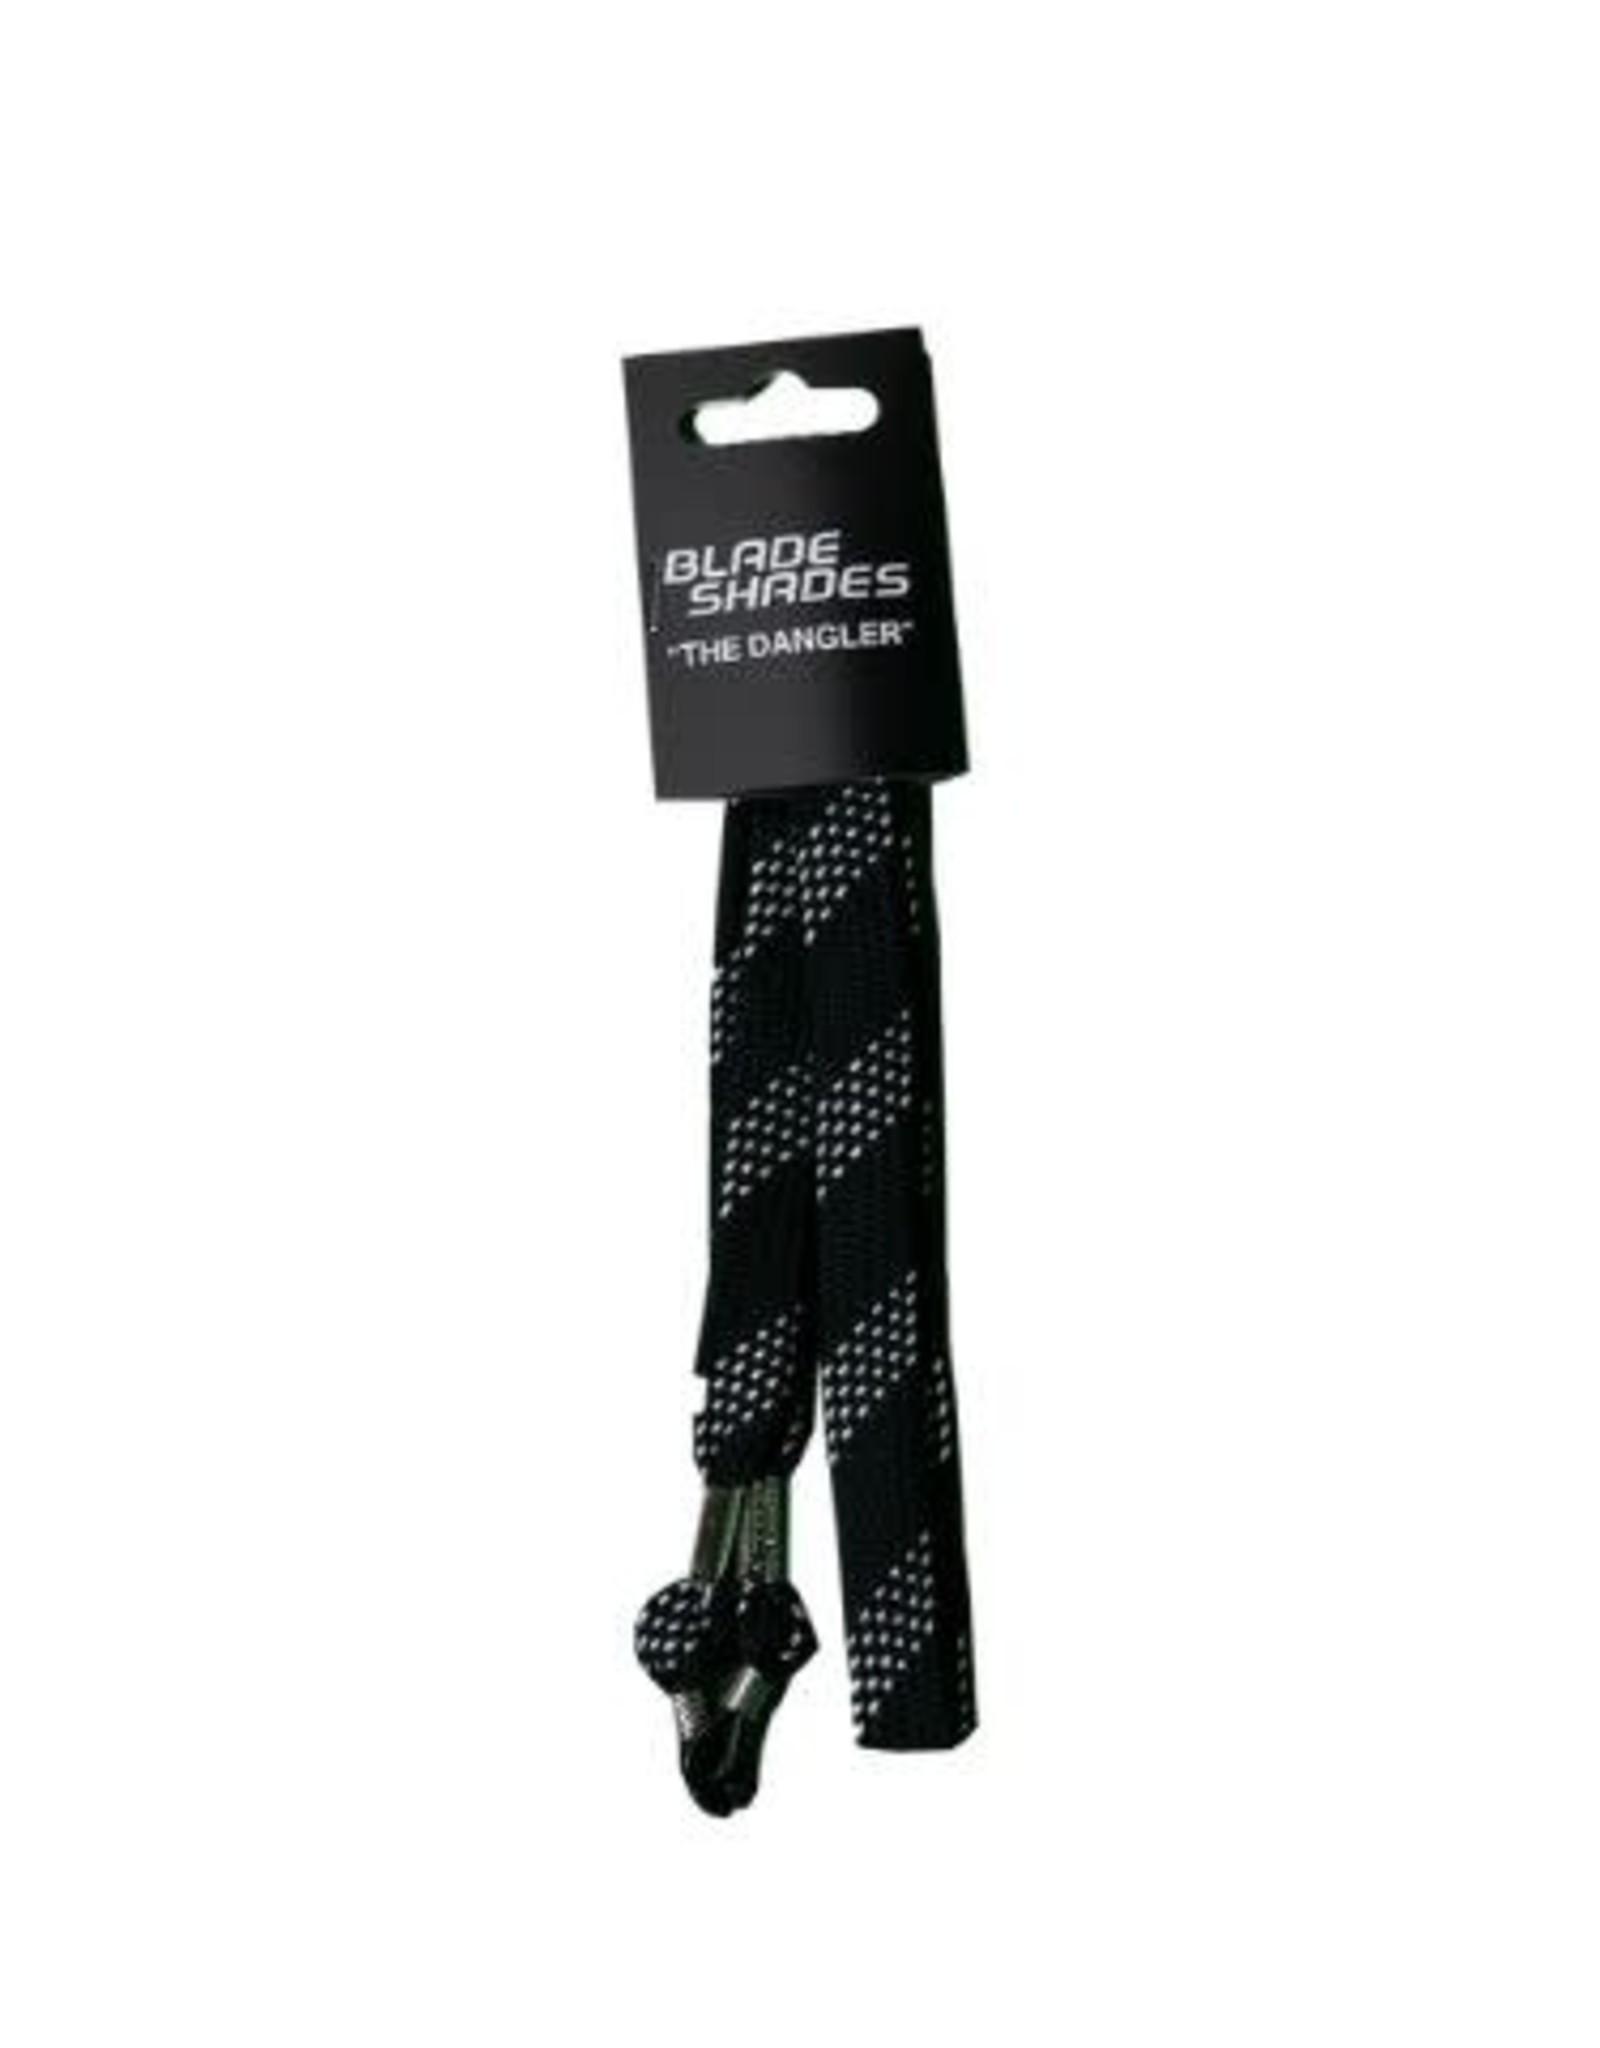 Blade Shades Blade Shades Dangler Sunglass Strap (BLACK)